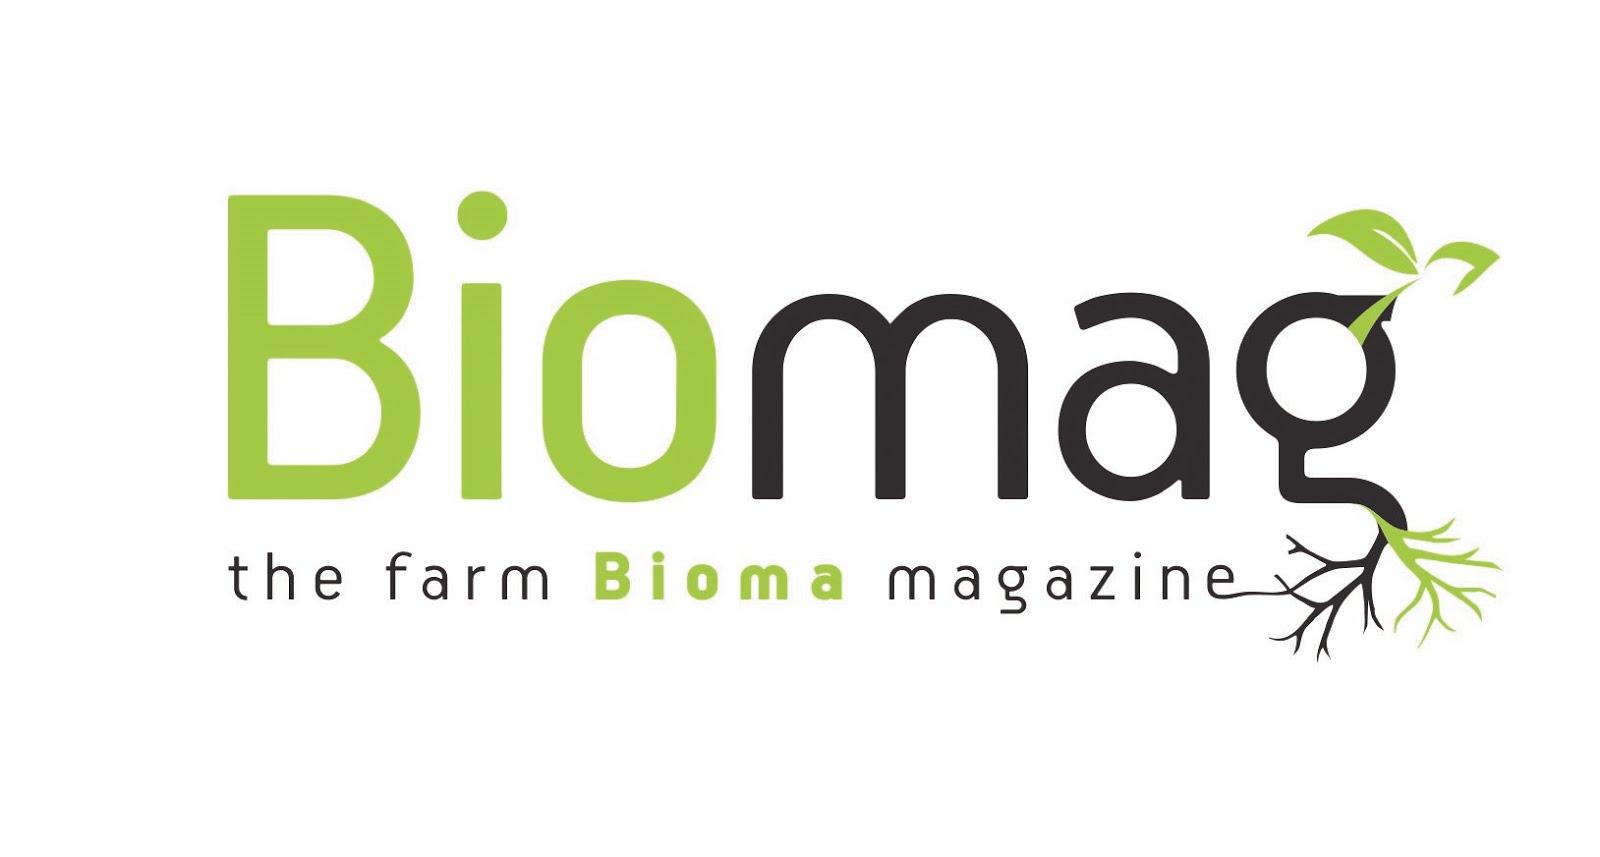 Biomag - το περιοδικό μας